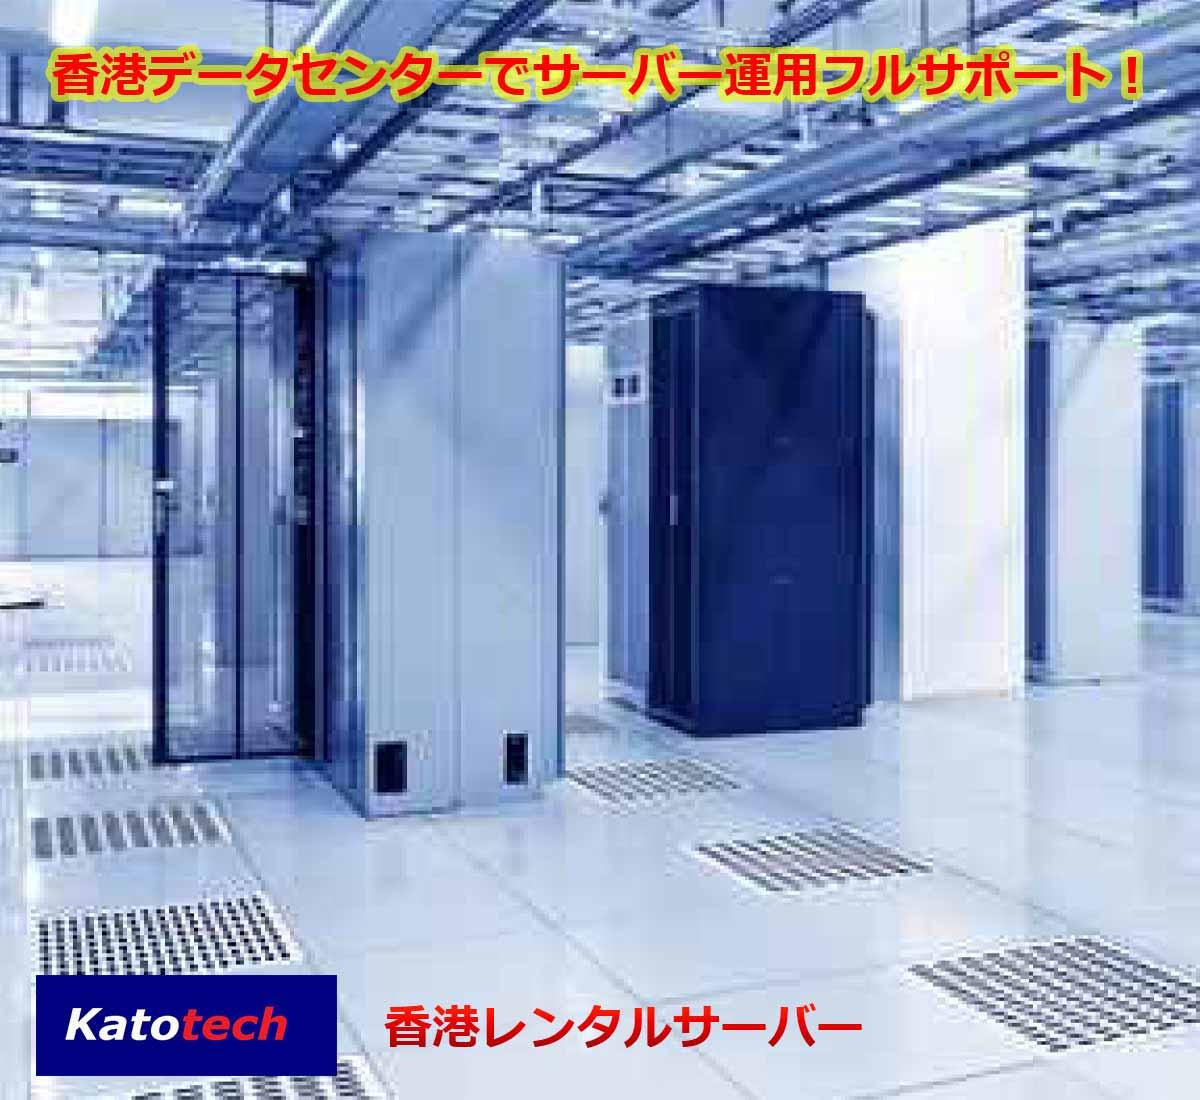 Server rental